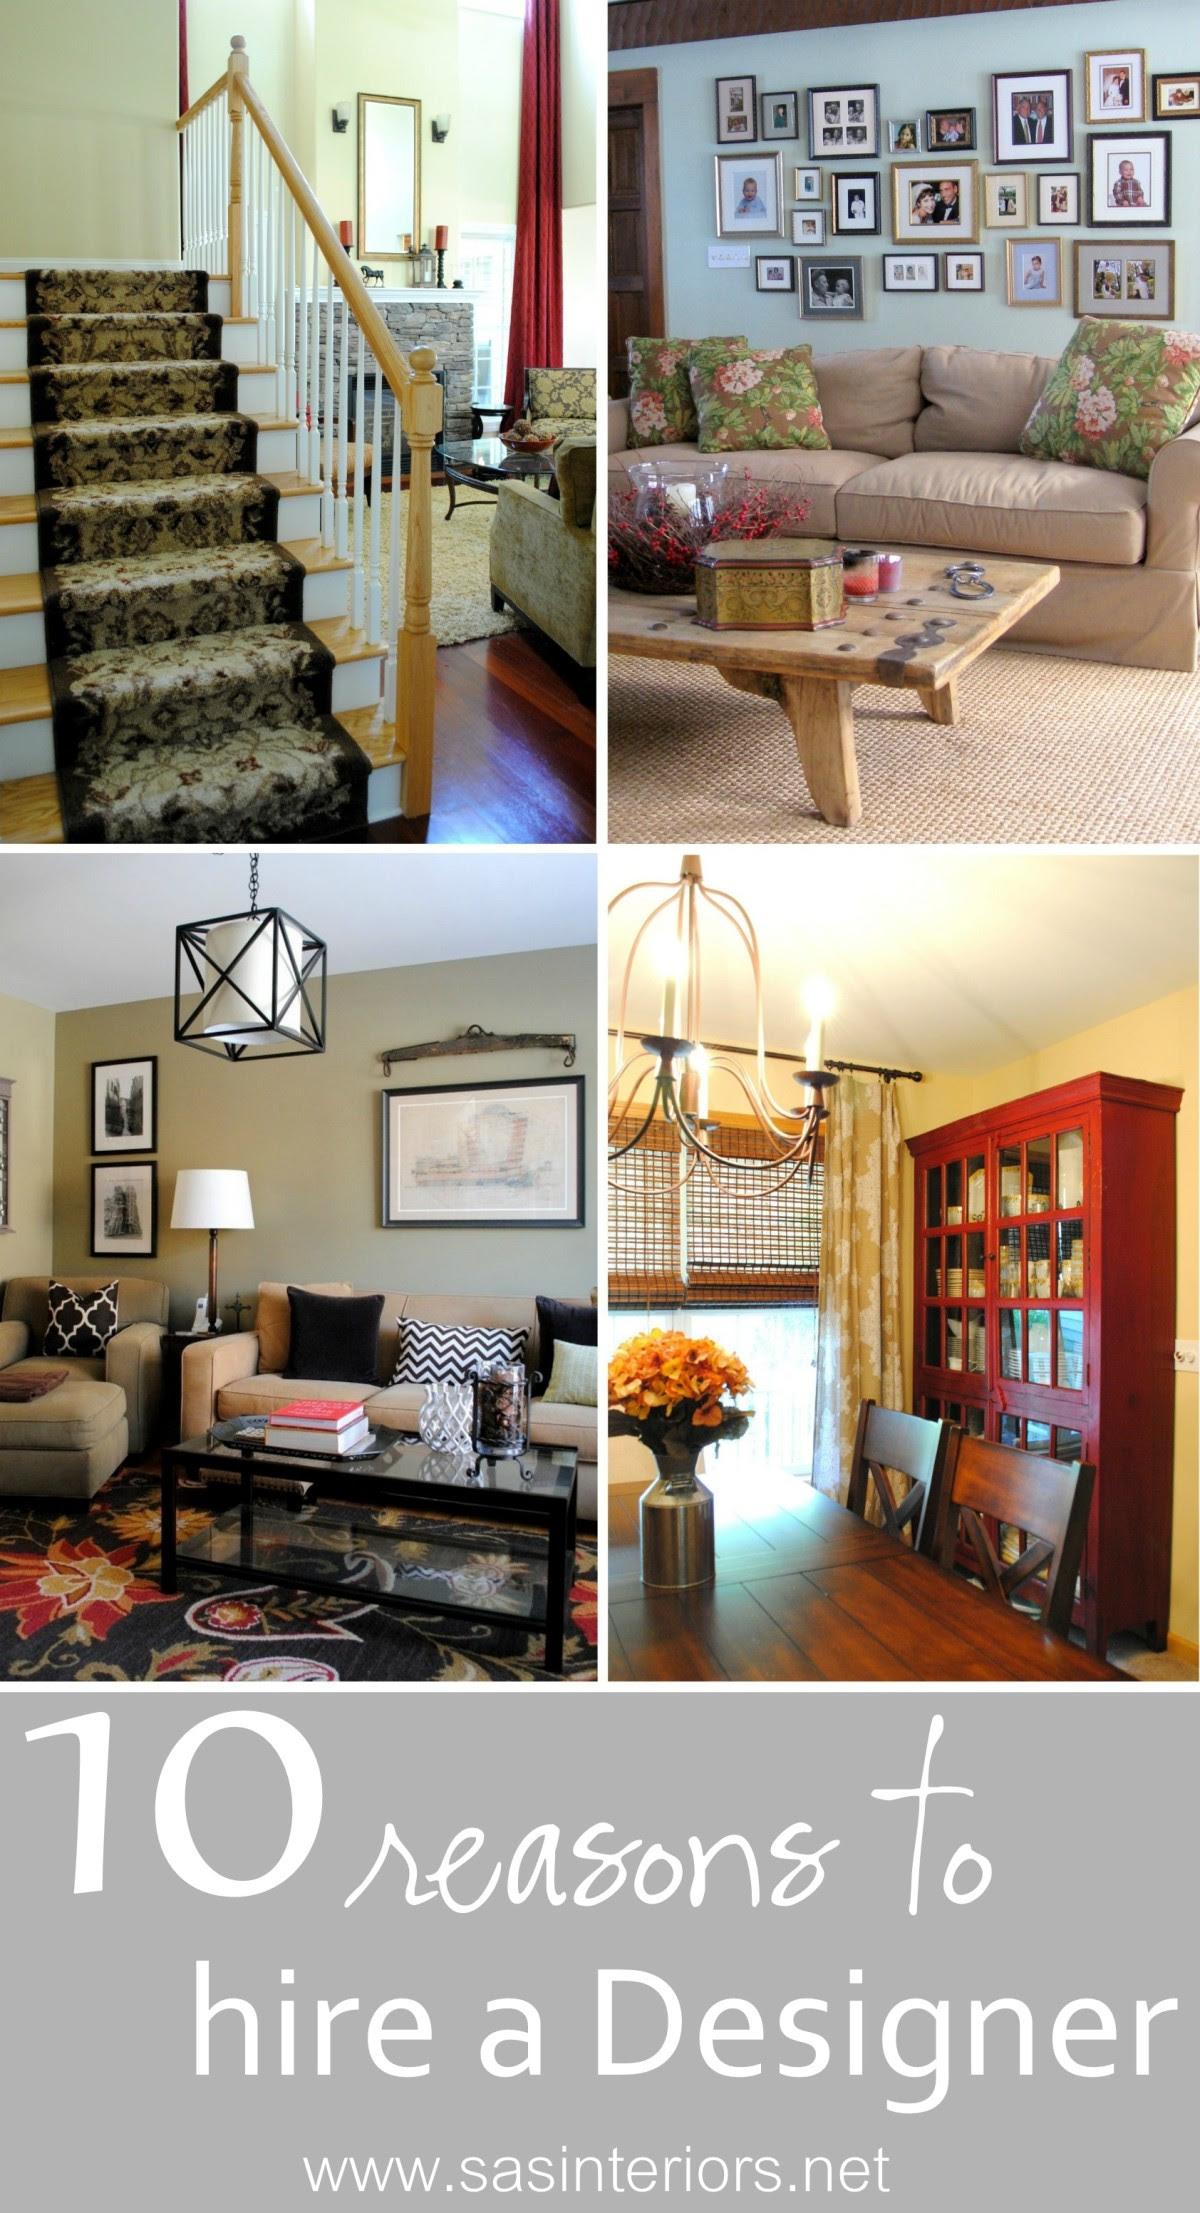 Elle Interiors | why hire an interior designer?